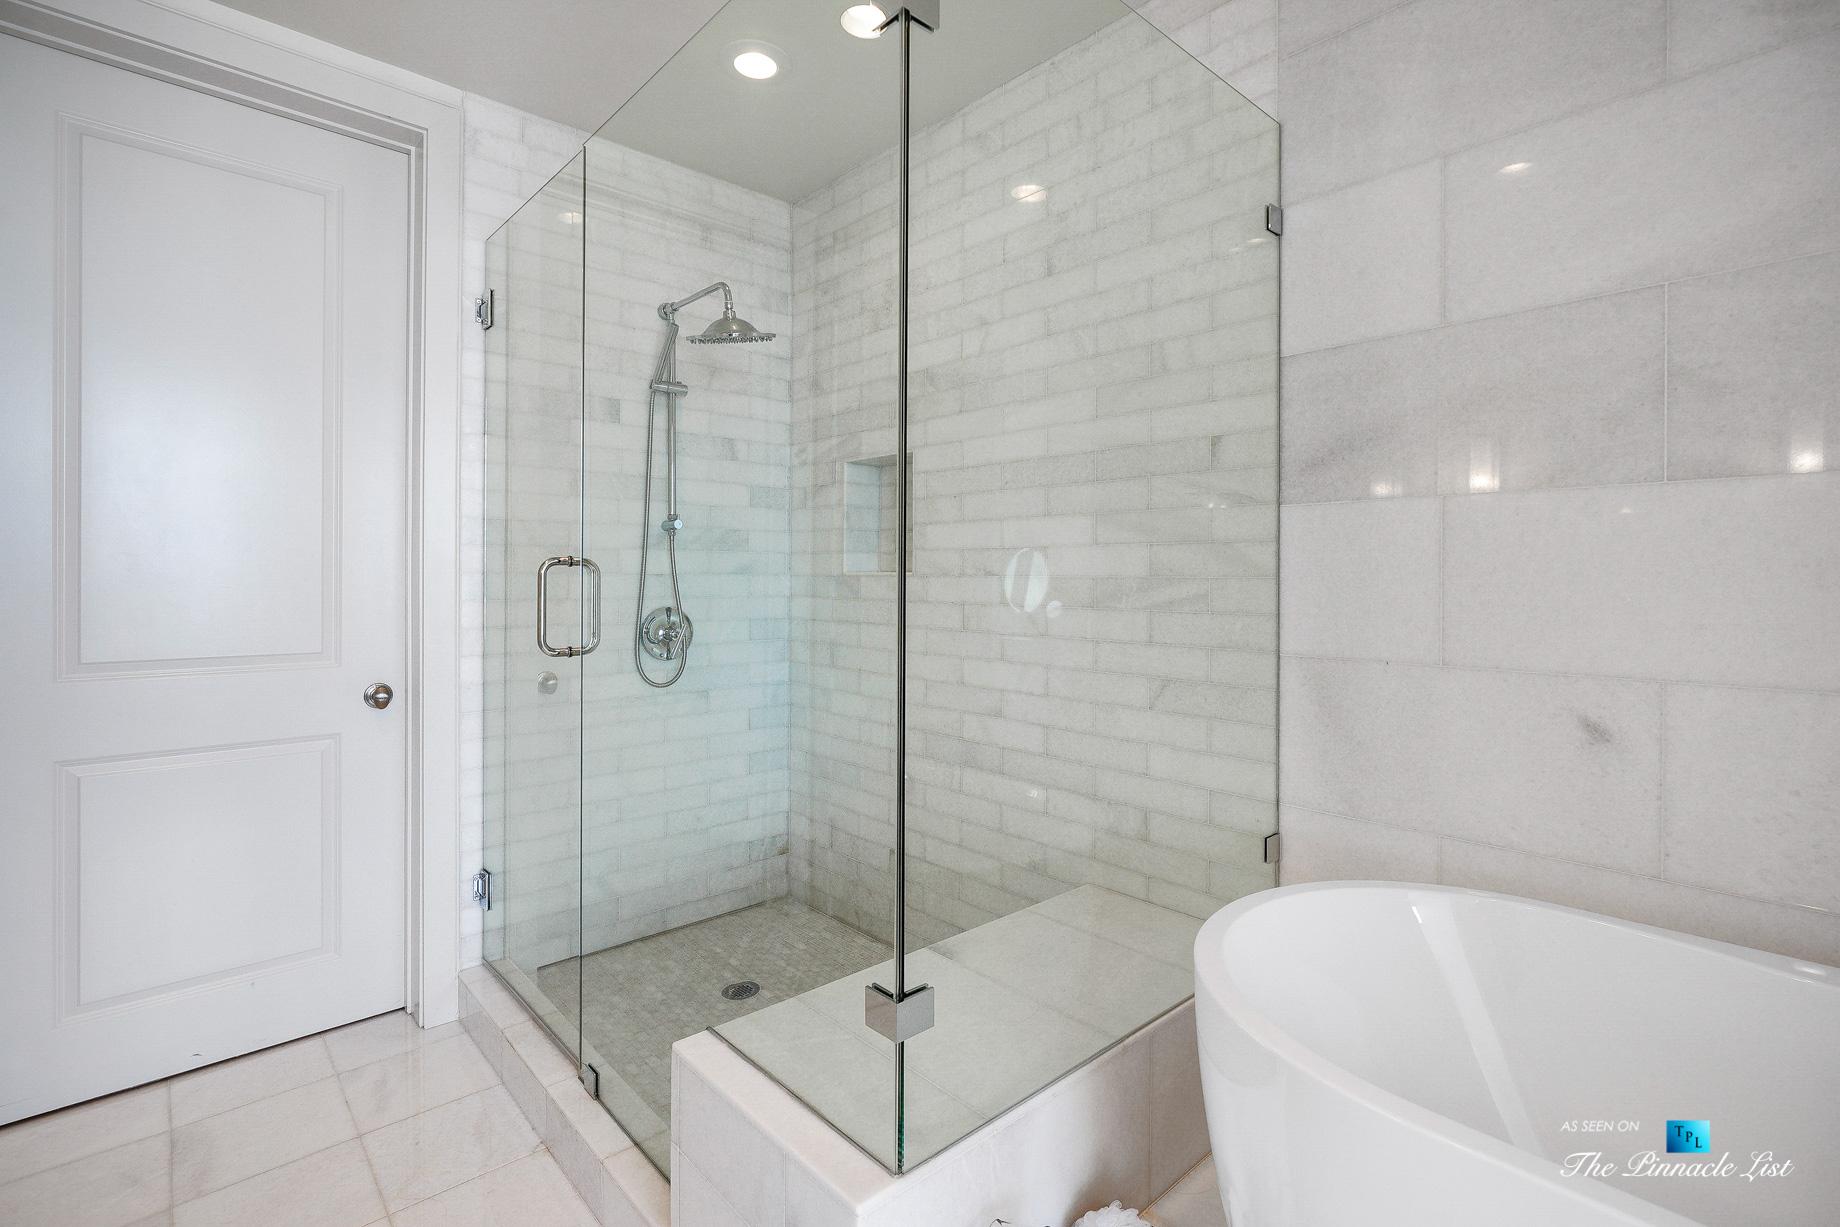 3630 Peachtree Rd NE, Unit 2307, Atlanta, GA, USA - Apartment Master Bathroom Shower - Luxury Real Estate - Ritz-Carlton Residences Buckhead